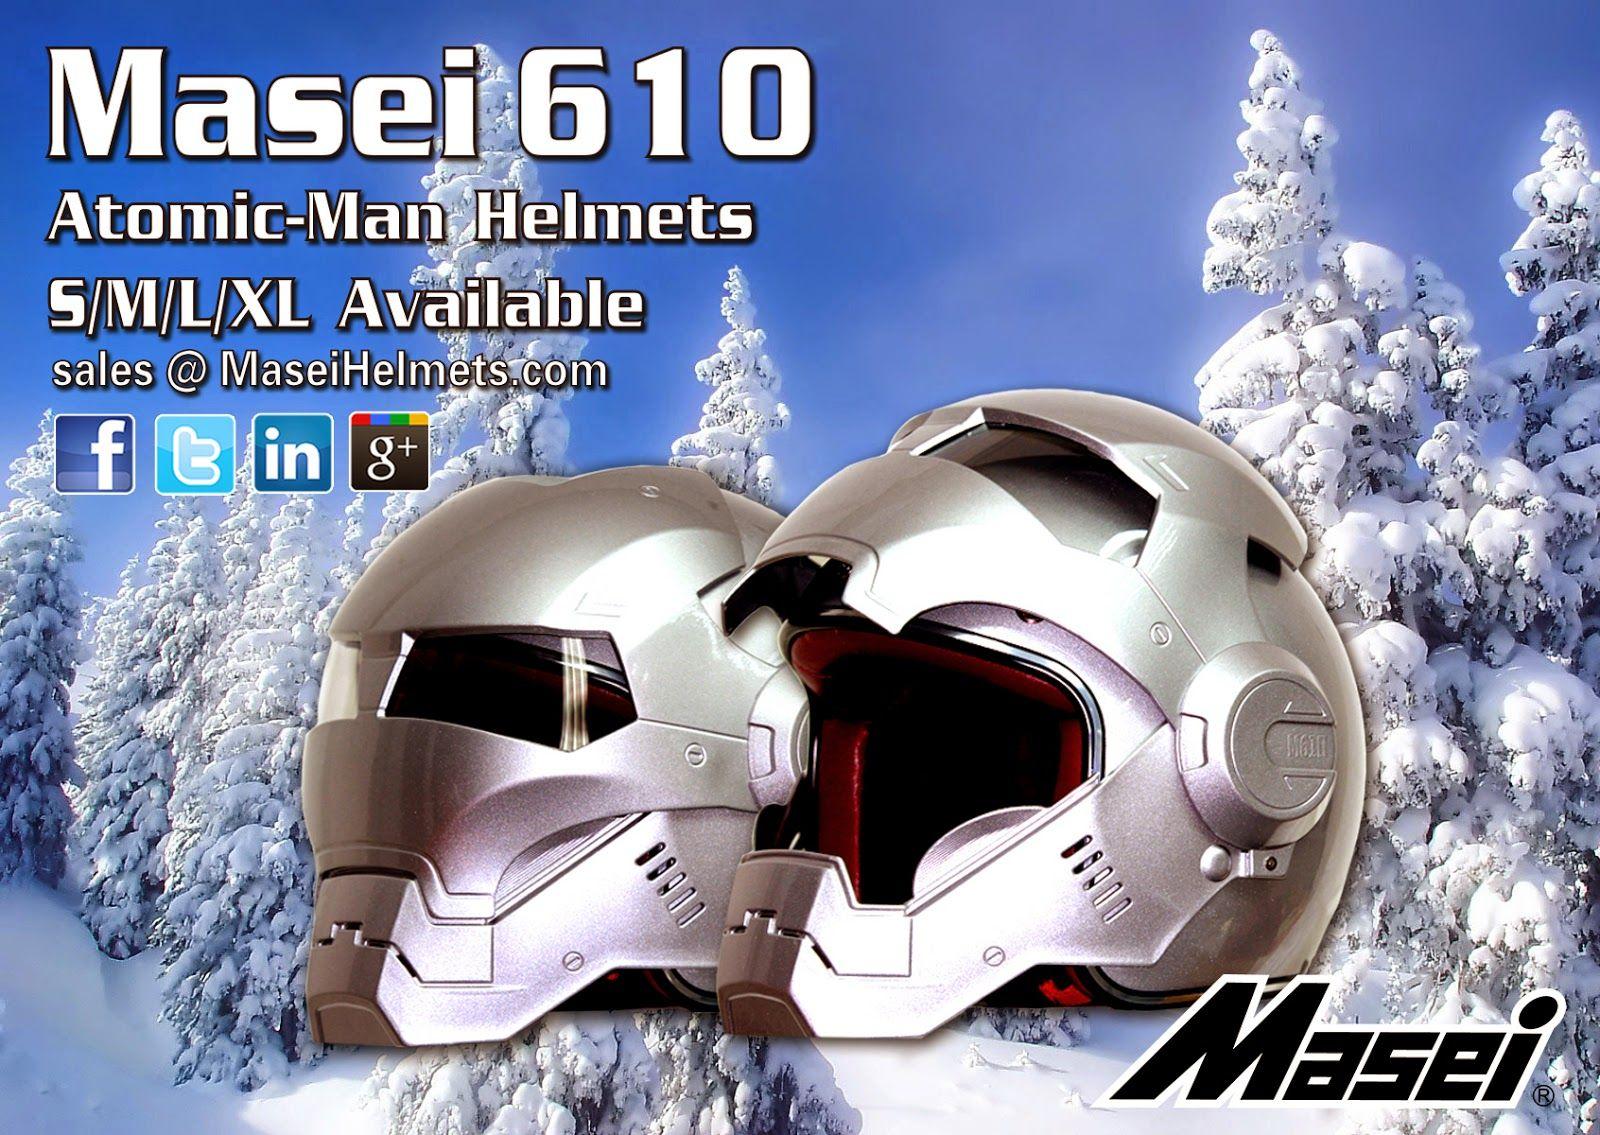 Masei 610 Atomic-Man Motorcycle DOT Snowmobile Harley Davidson Helmet in Silver Color